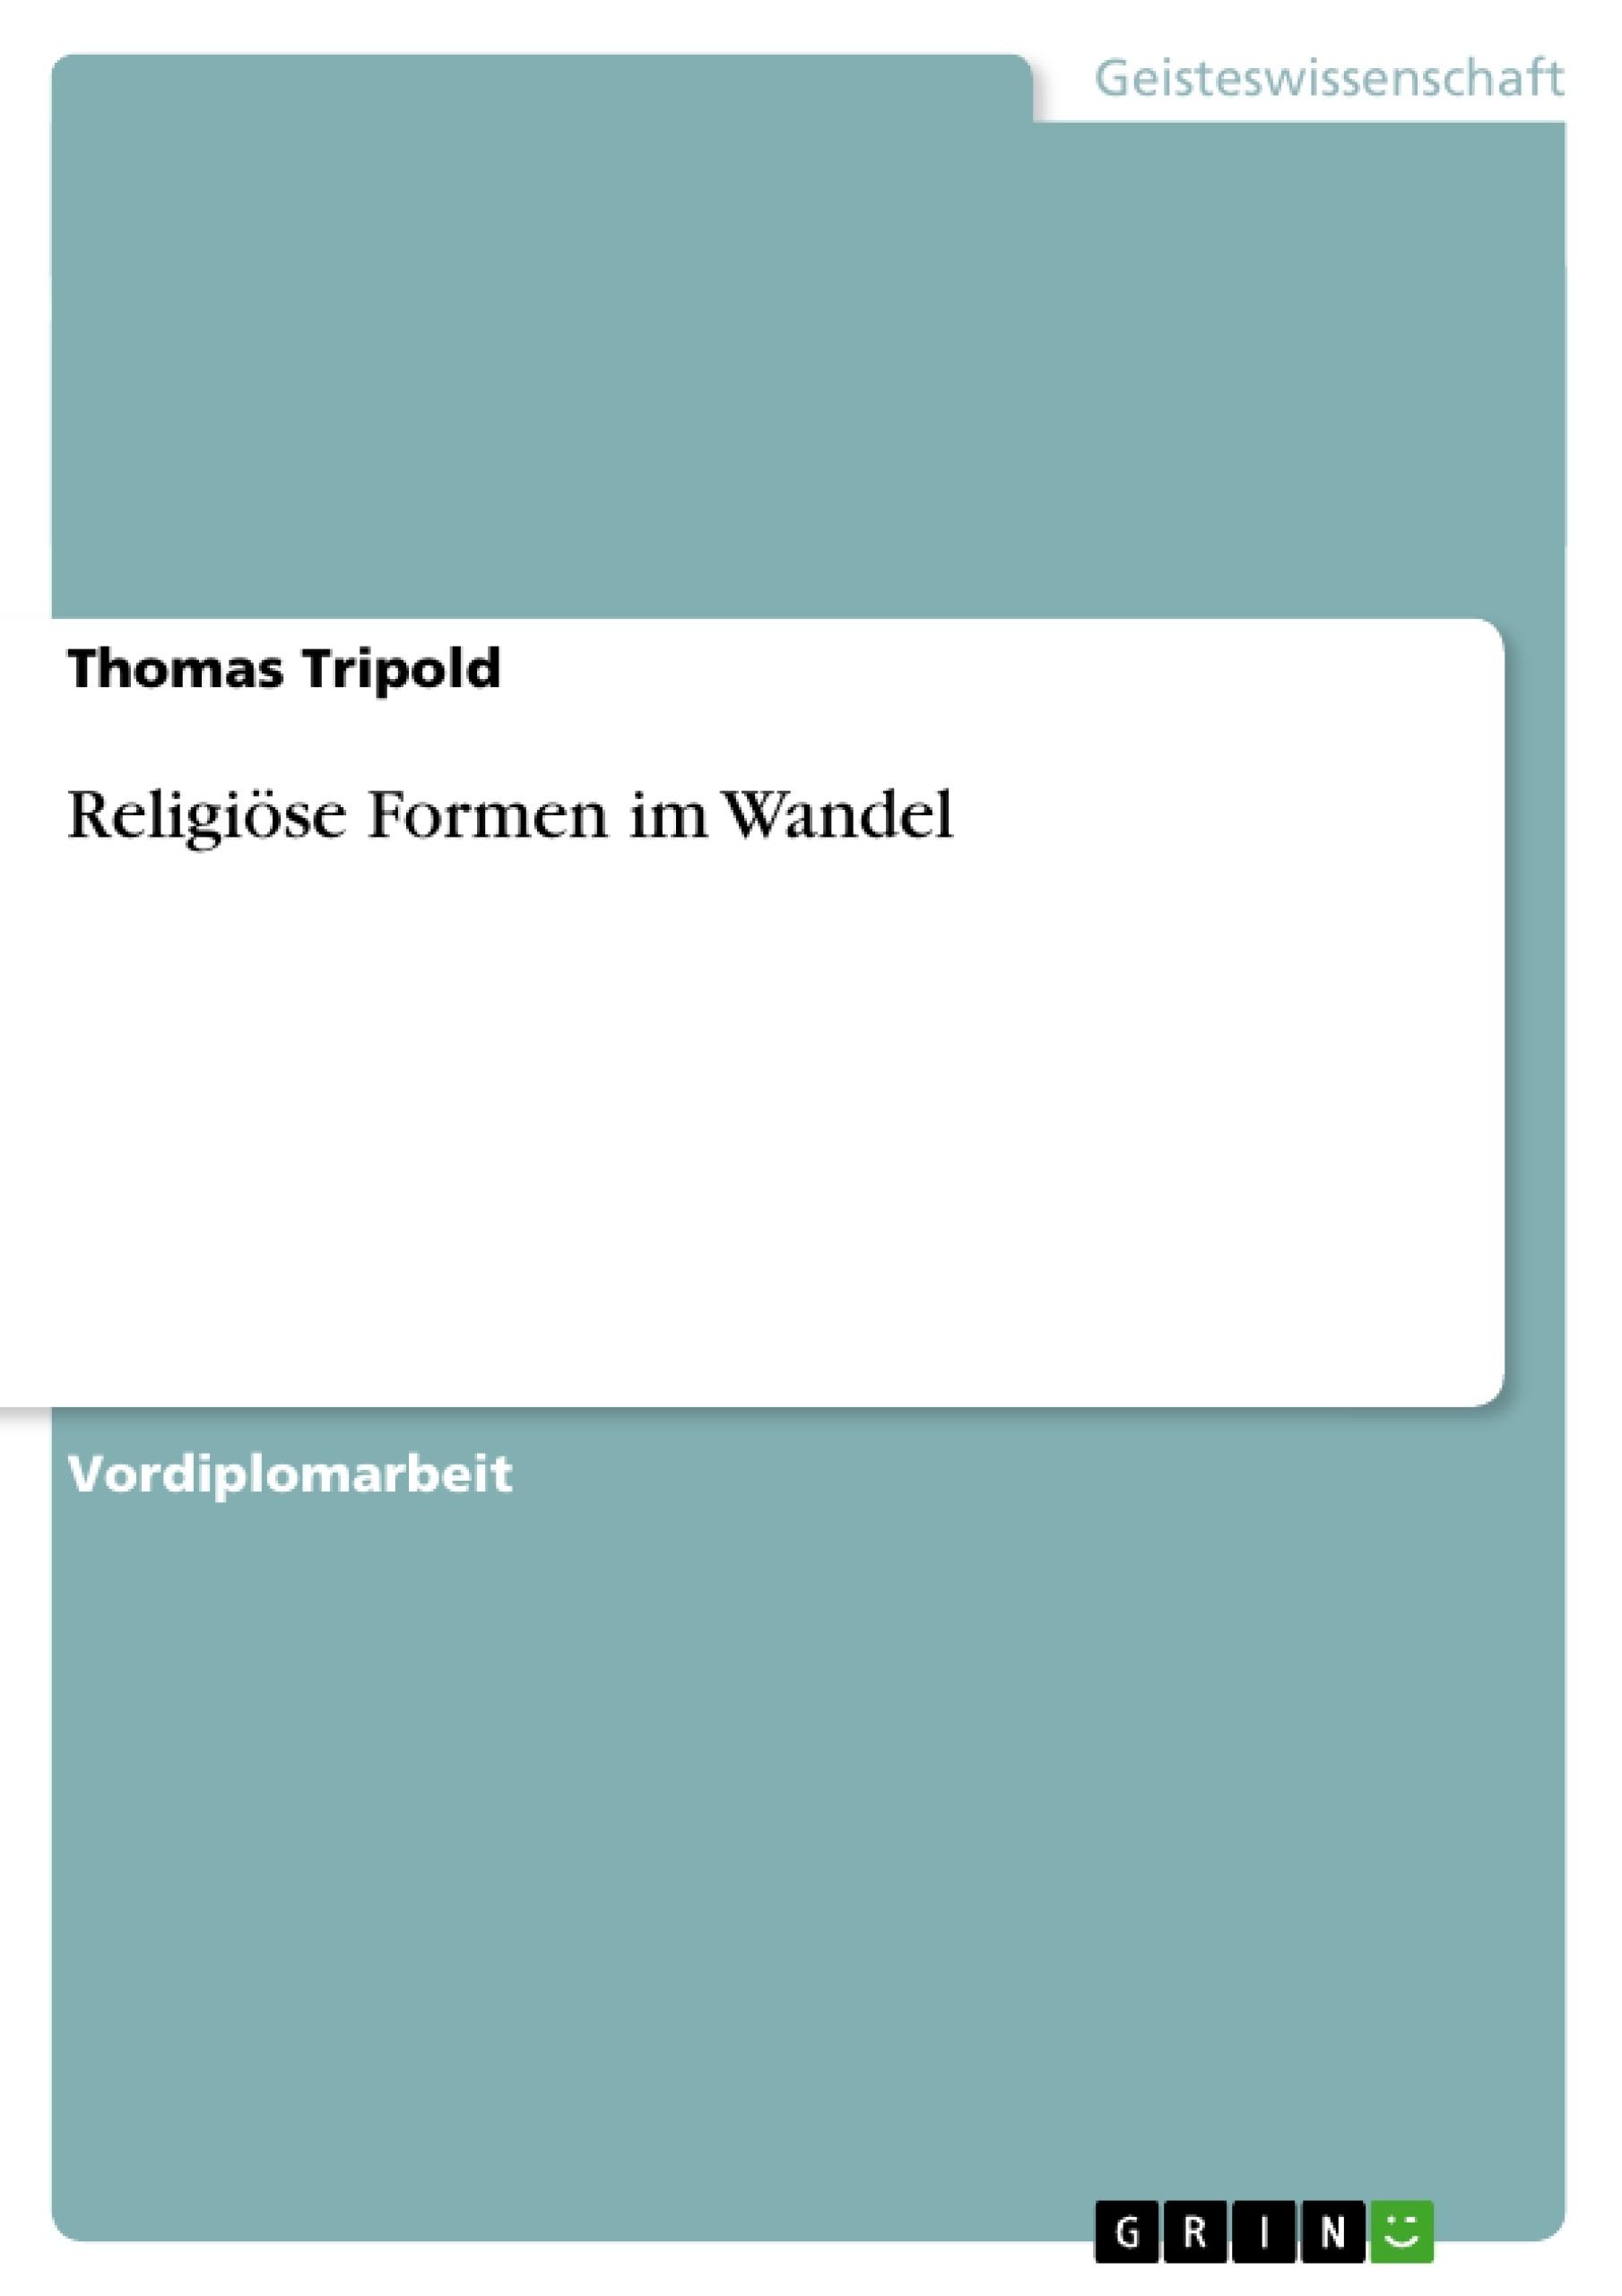 Titel: Religiöse Formen im Wandel